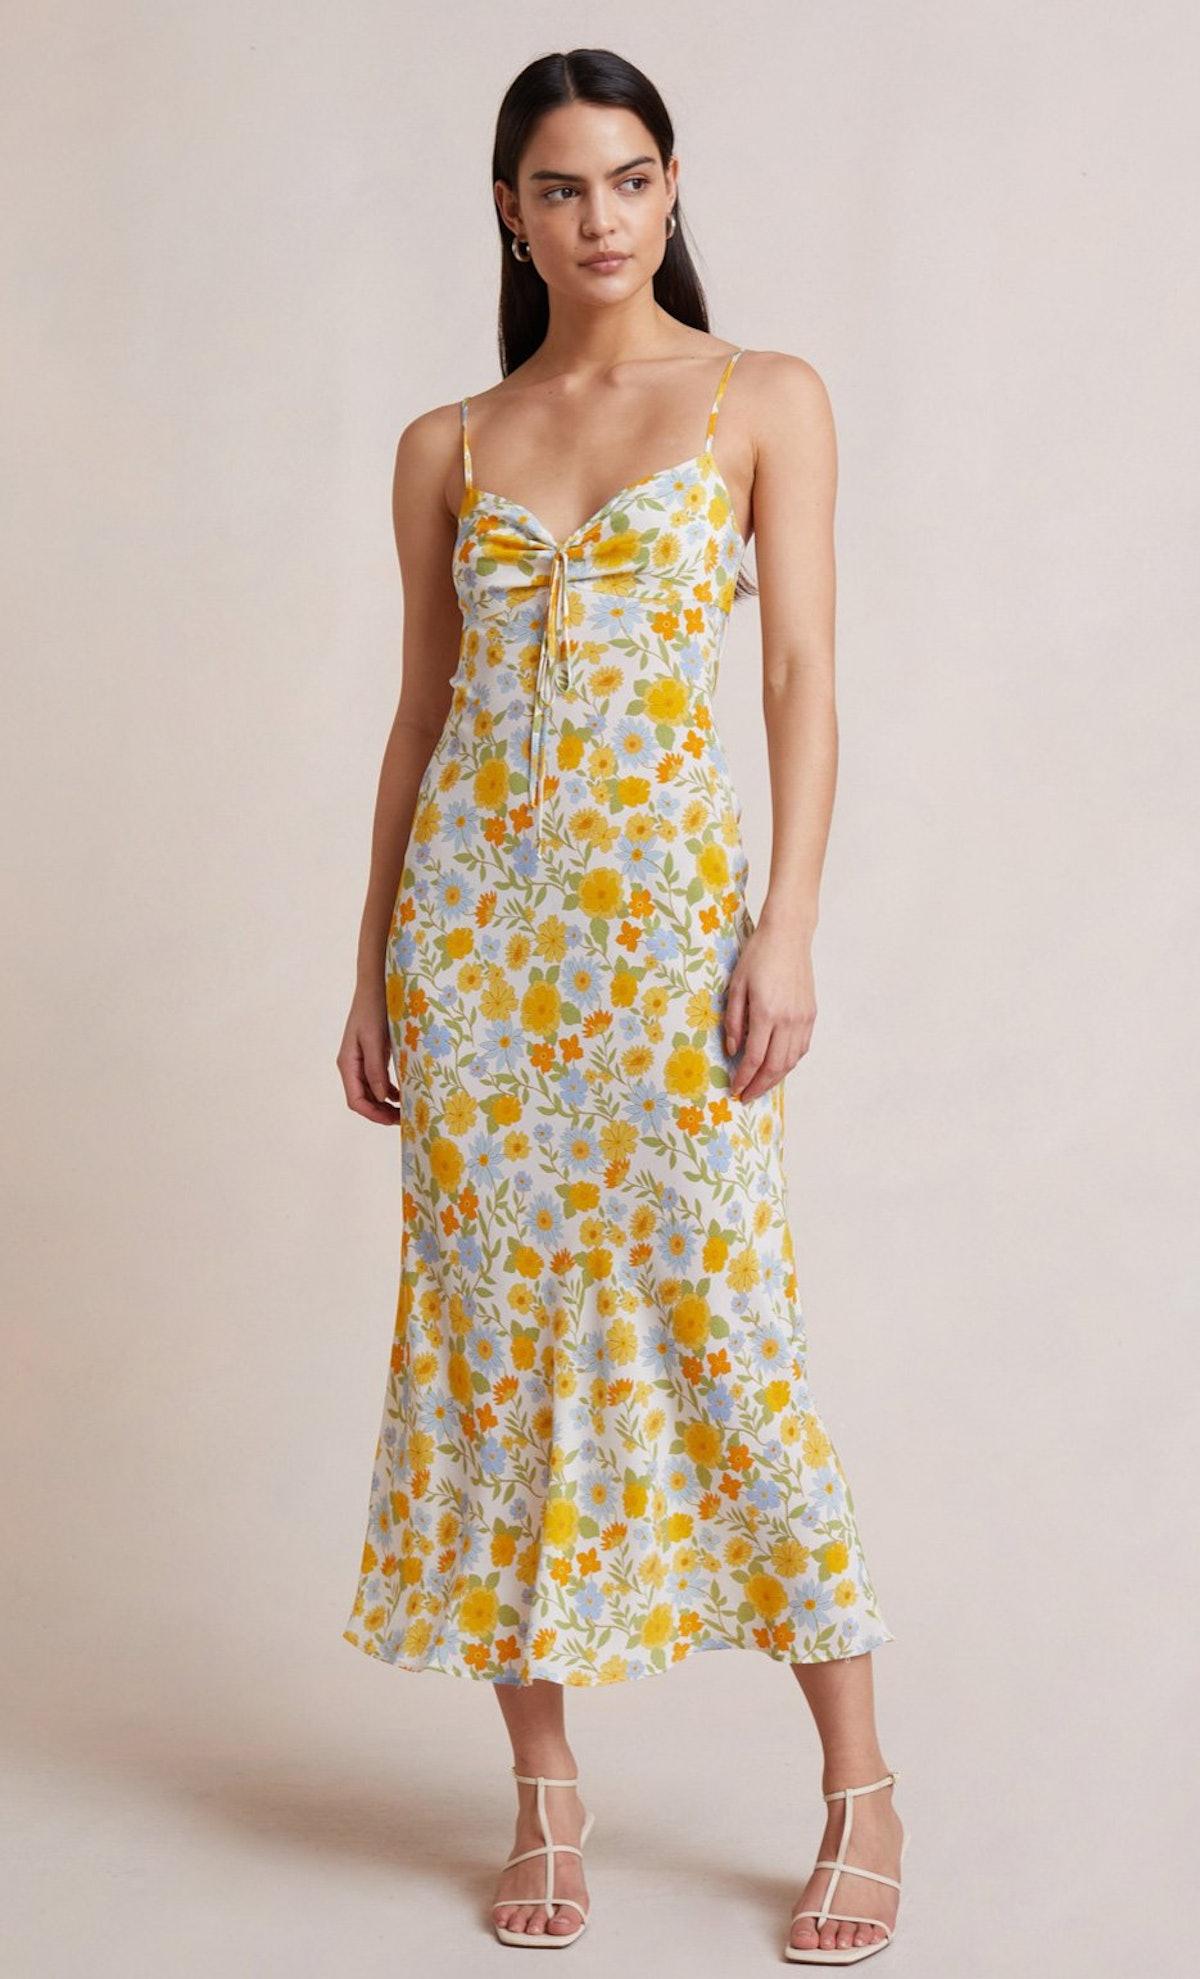 Cali Sun midi dress from BEC + BRIDGE.